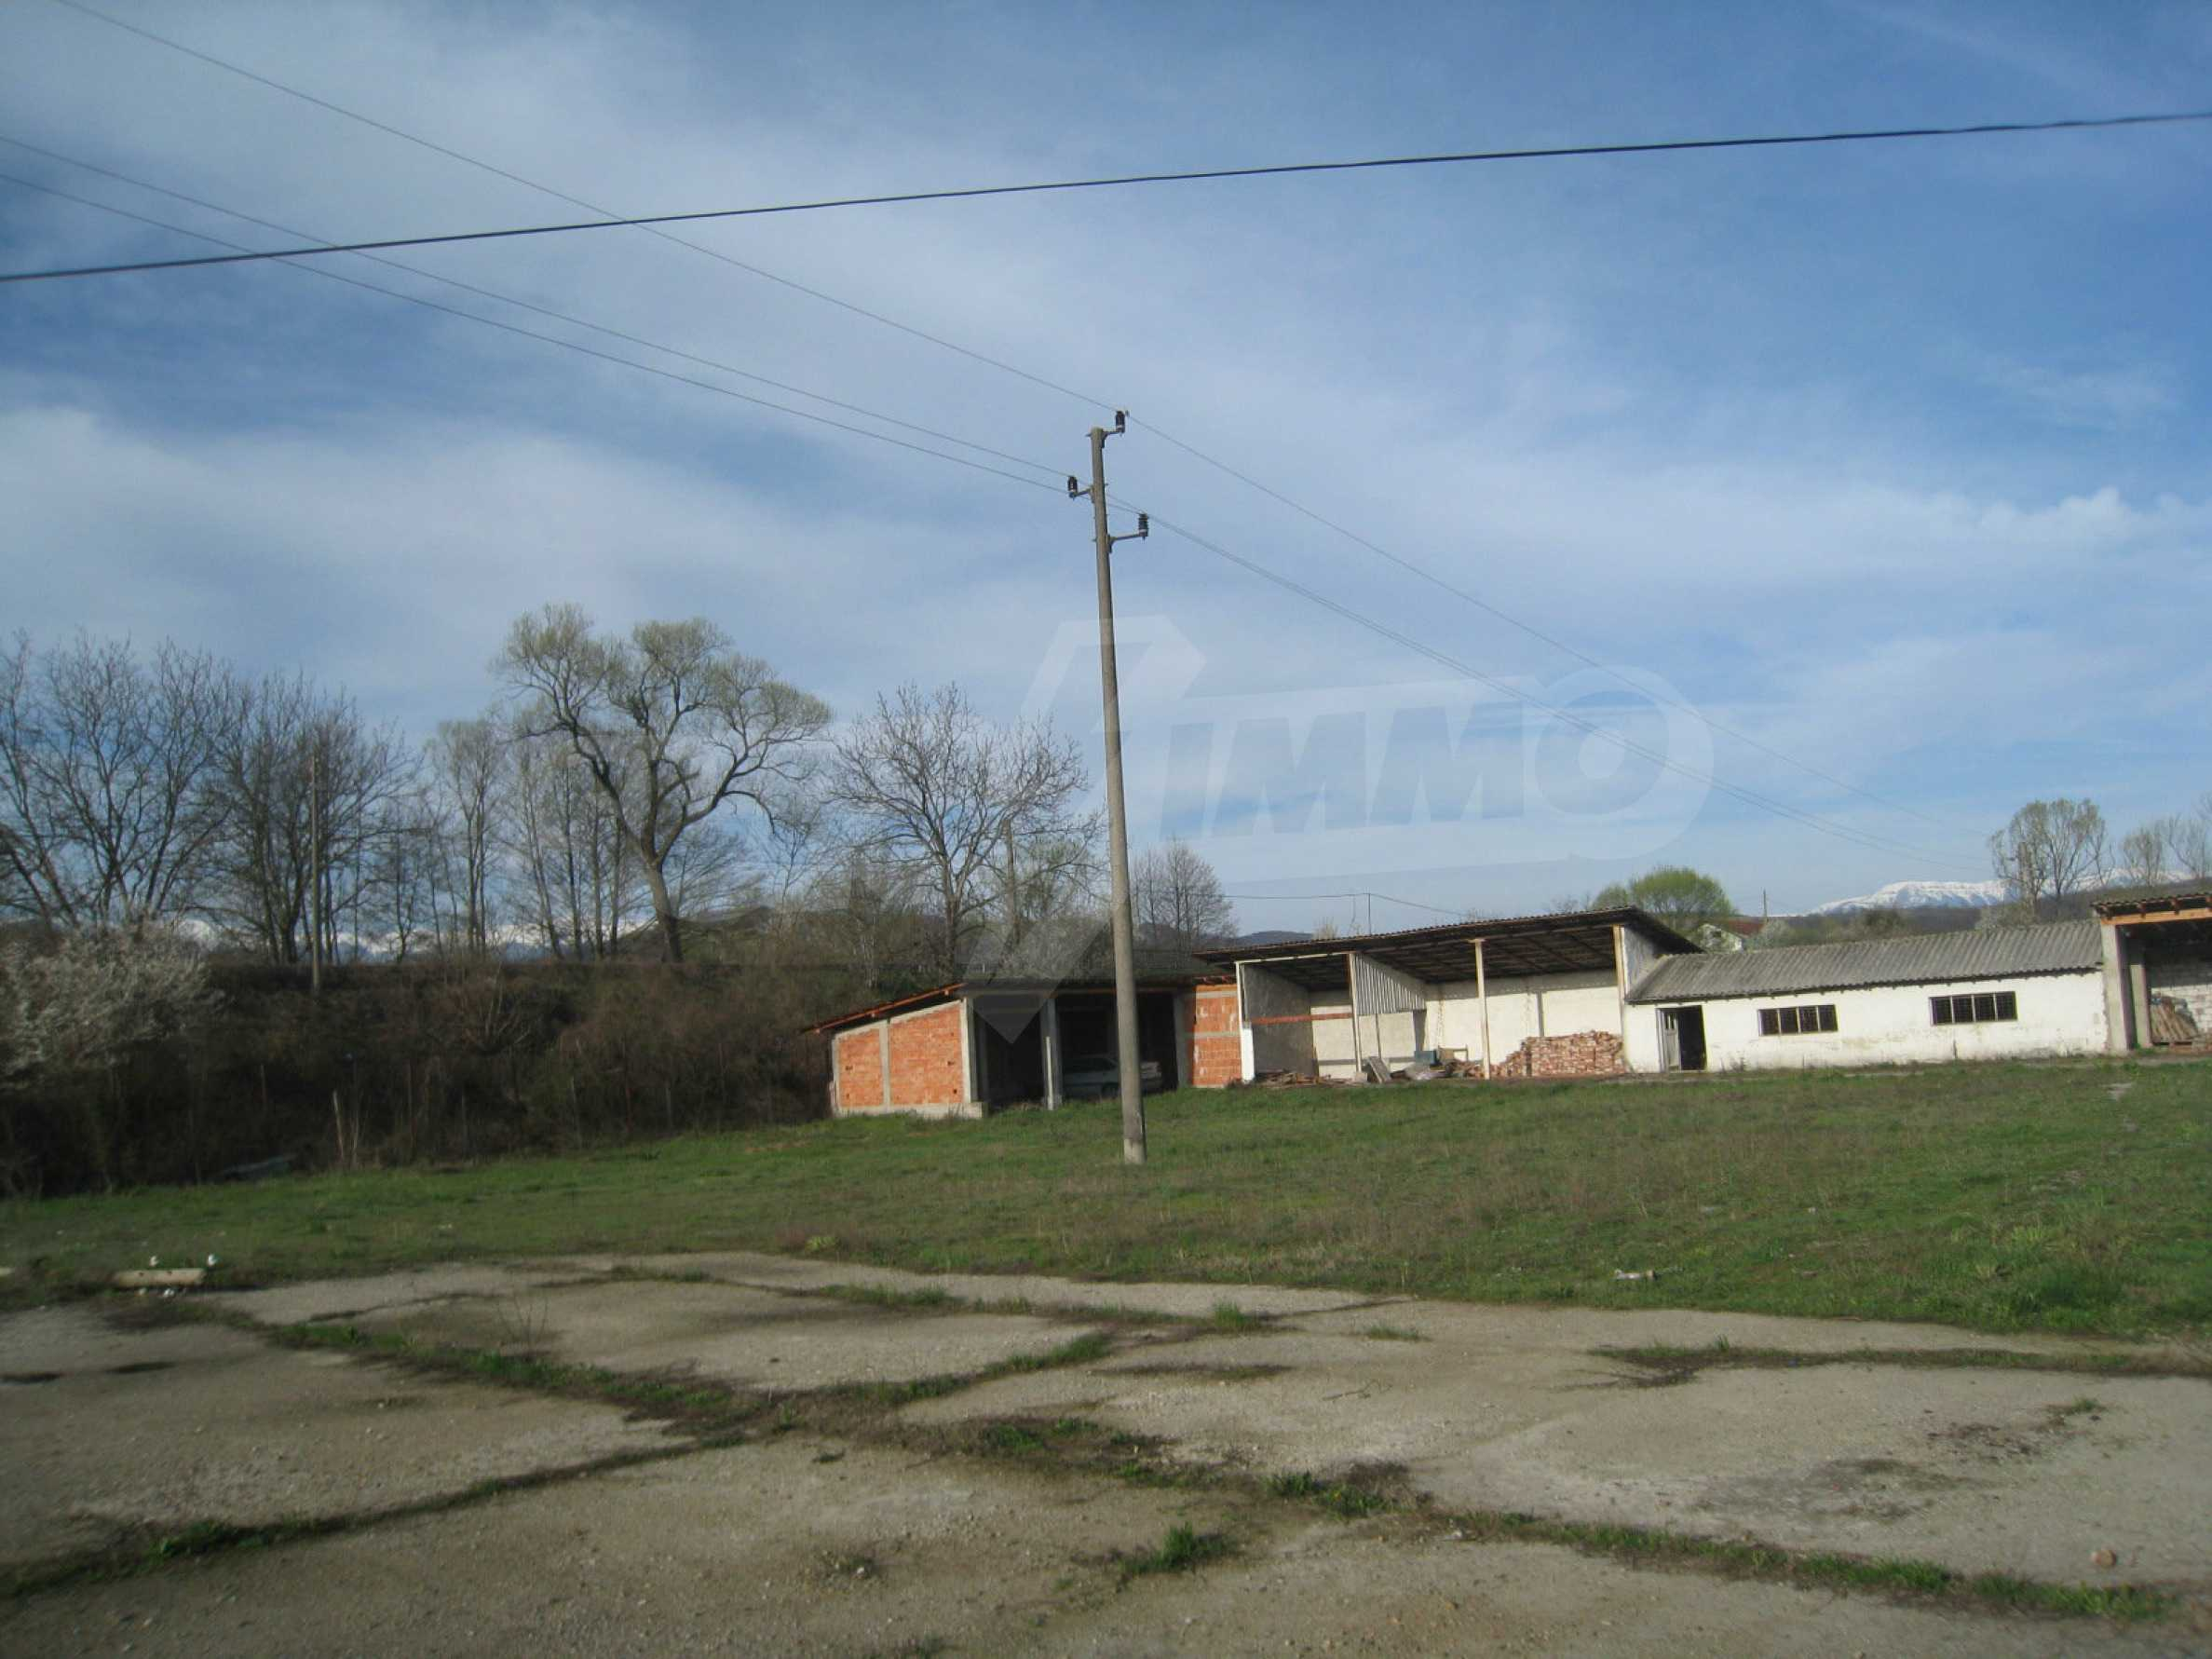 Fishpond, warehouses, residential areas and asphalt ground near Montana 36